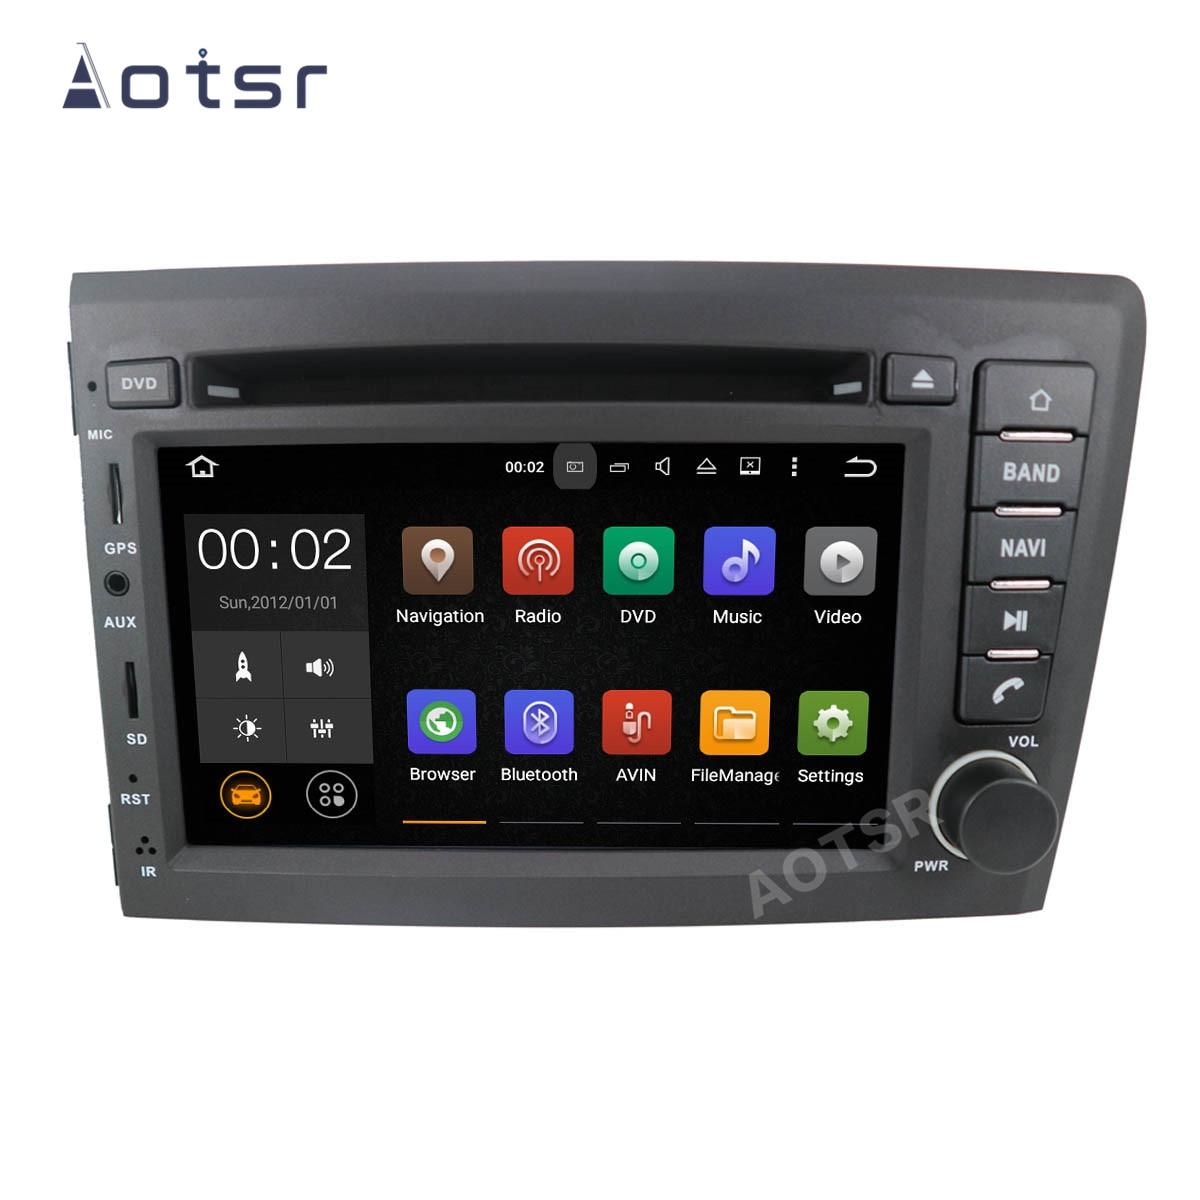 AOTSR 9 2 Coche Din Rádio Do Carro Android Para VOLVO S60 V70 XC70 2Din XC90 2000 2001 2002 2003 2004 Navegação GPS Autoradio